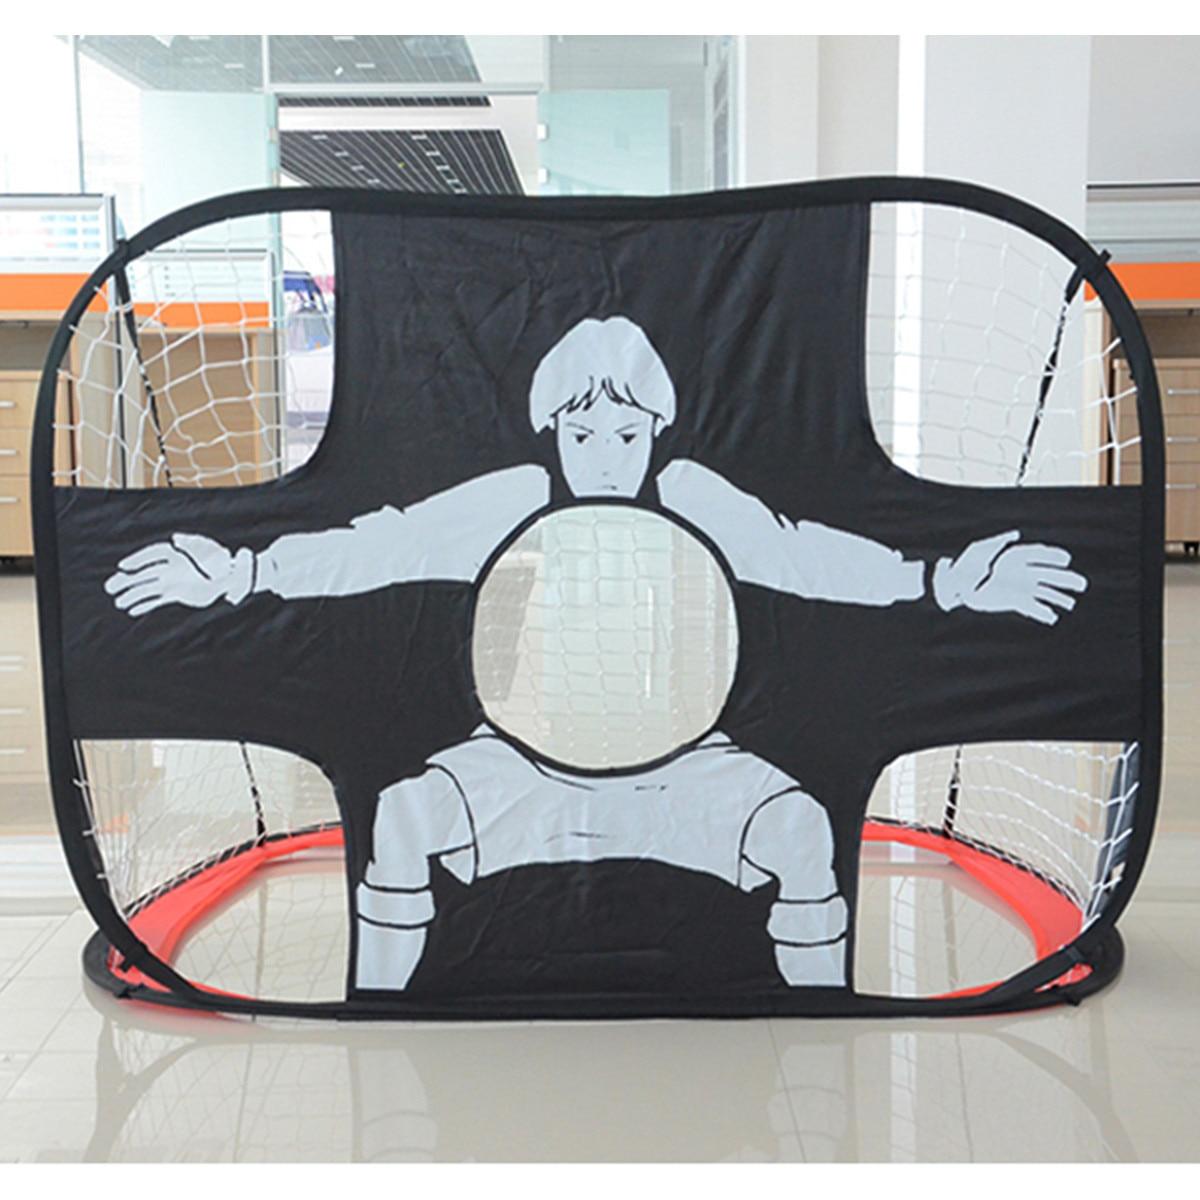 Folding Kid Football Gate Net Goal Gate Extra Sturdy Portable Soccer Ball Practice Gate for Children Students Soccer Training